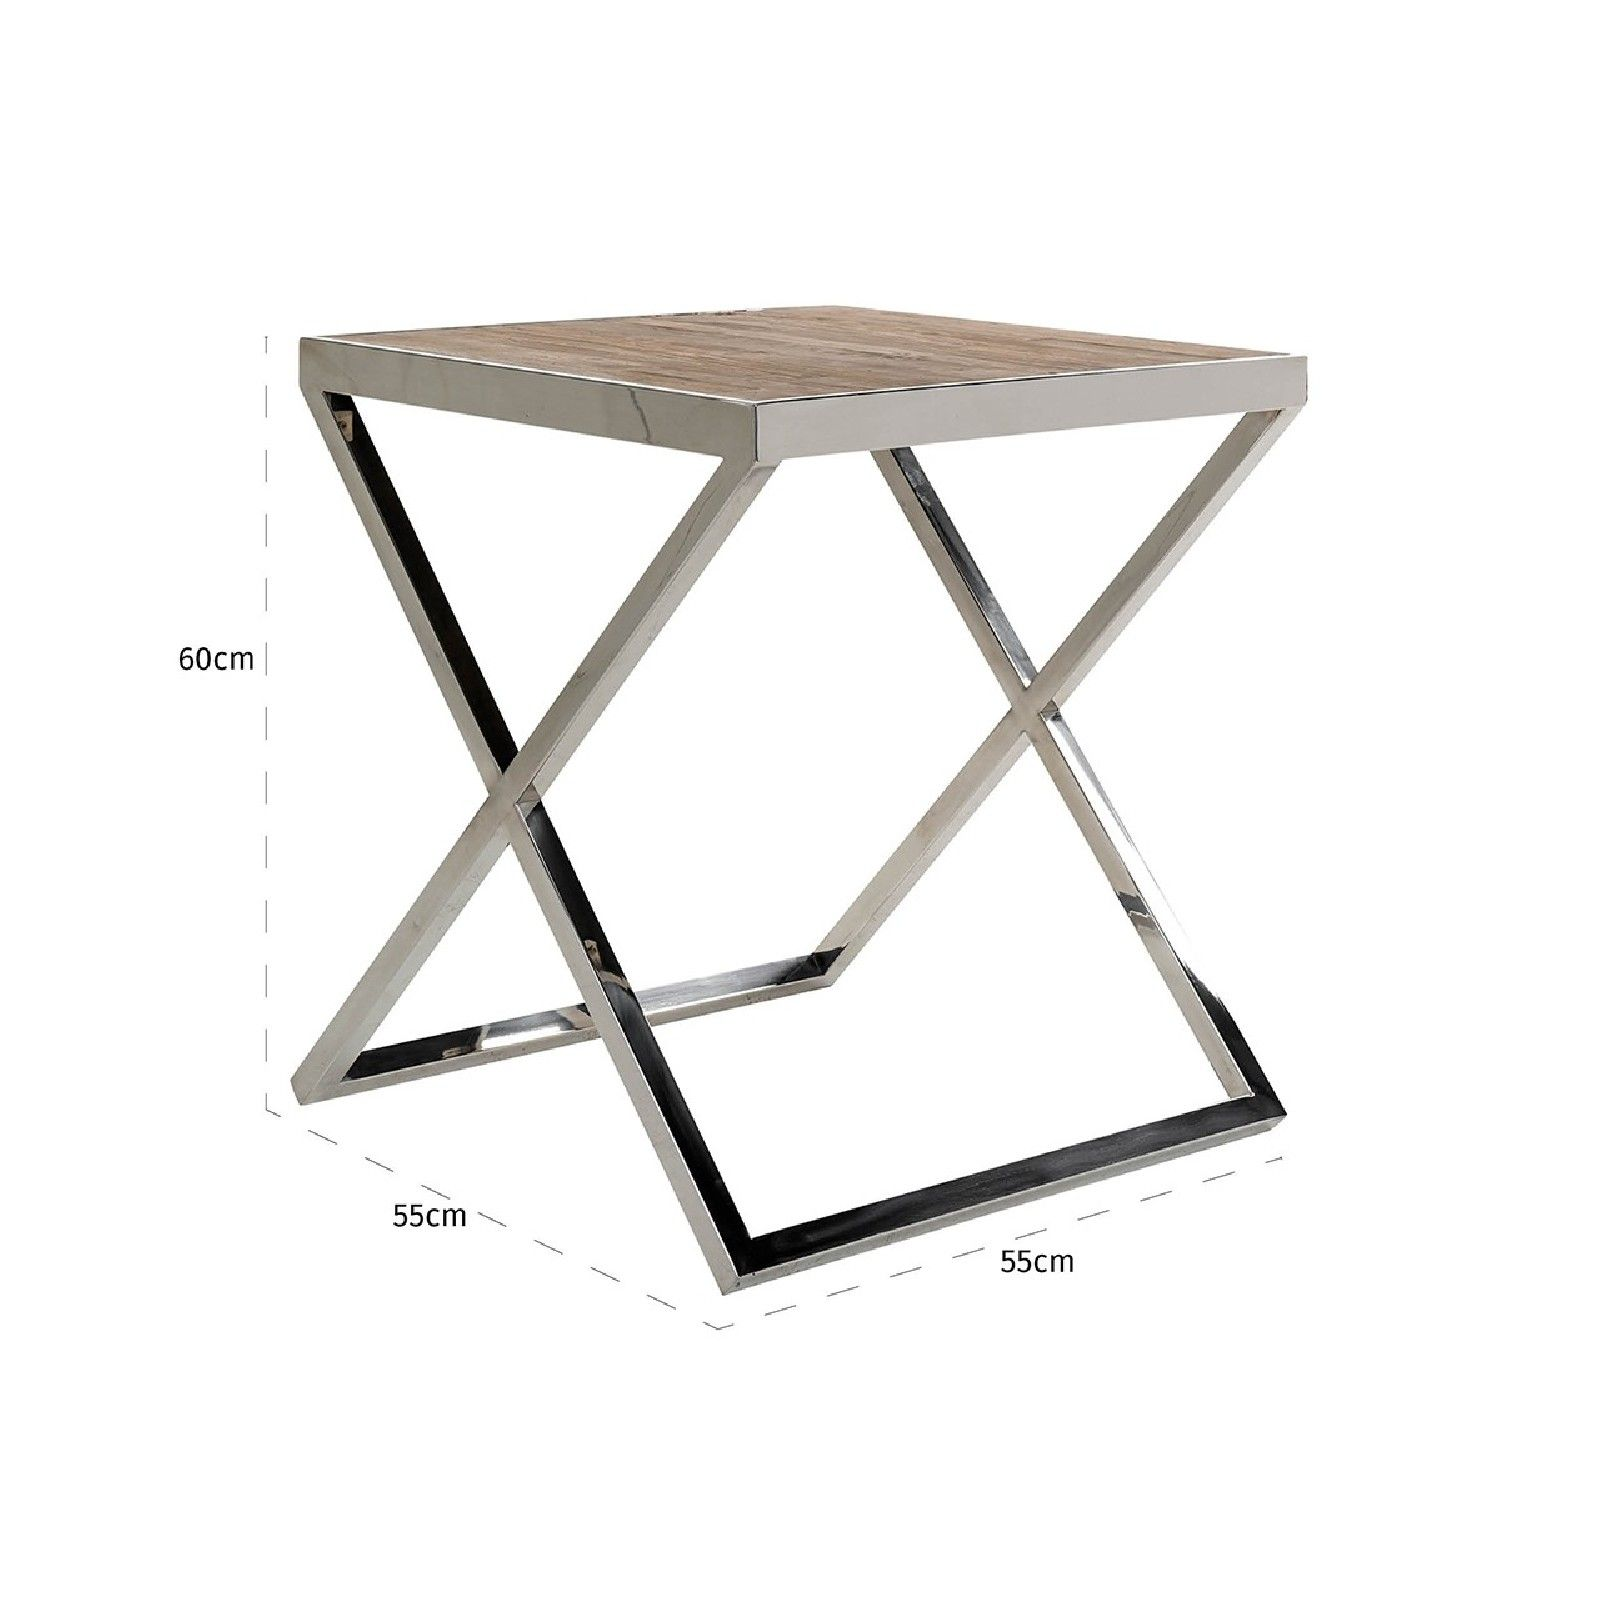 Table d'angle Redmond 55x55 Meuble Déco Tendance - 729